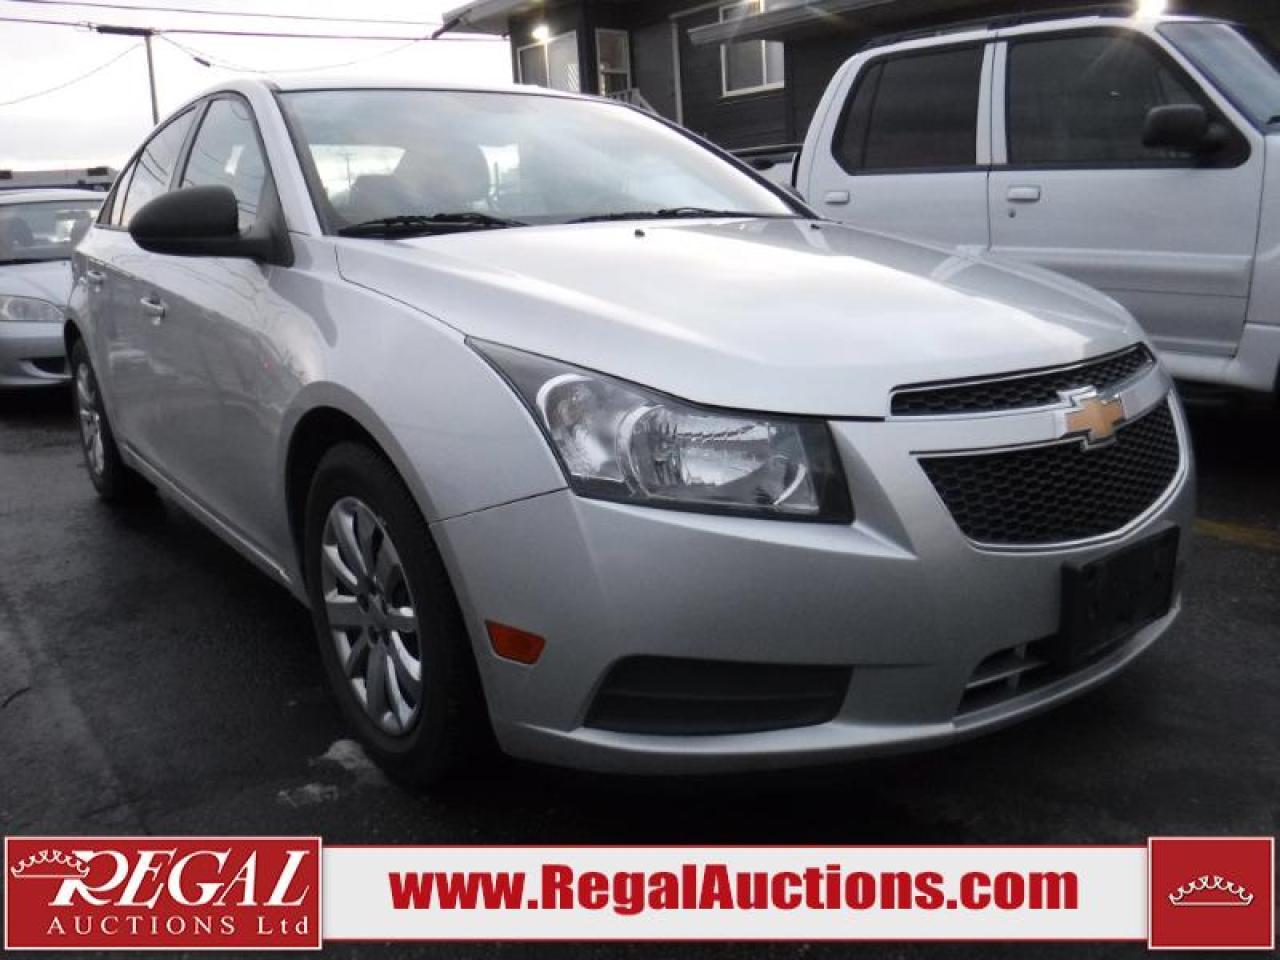 Photo of Silver 2013 Chevrolet Cruze